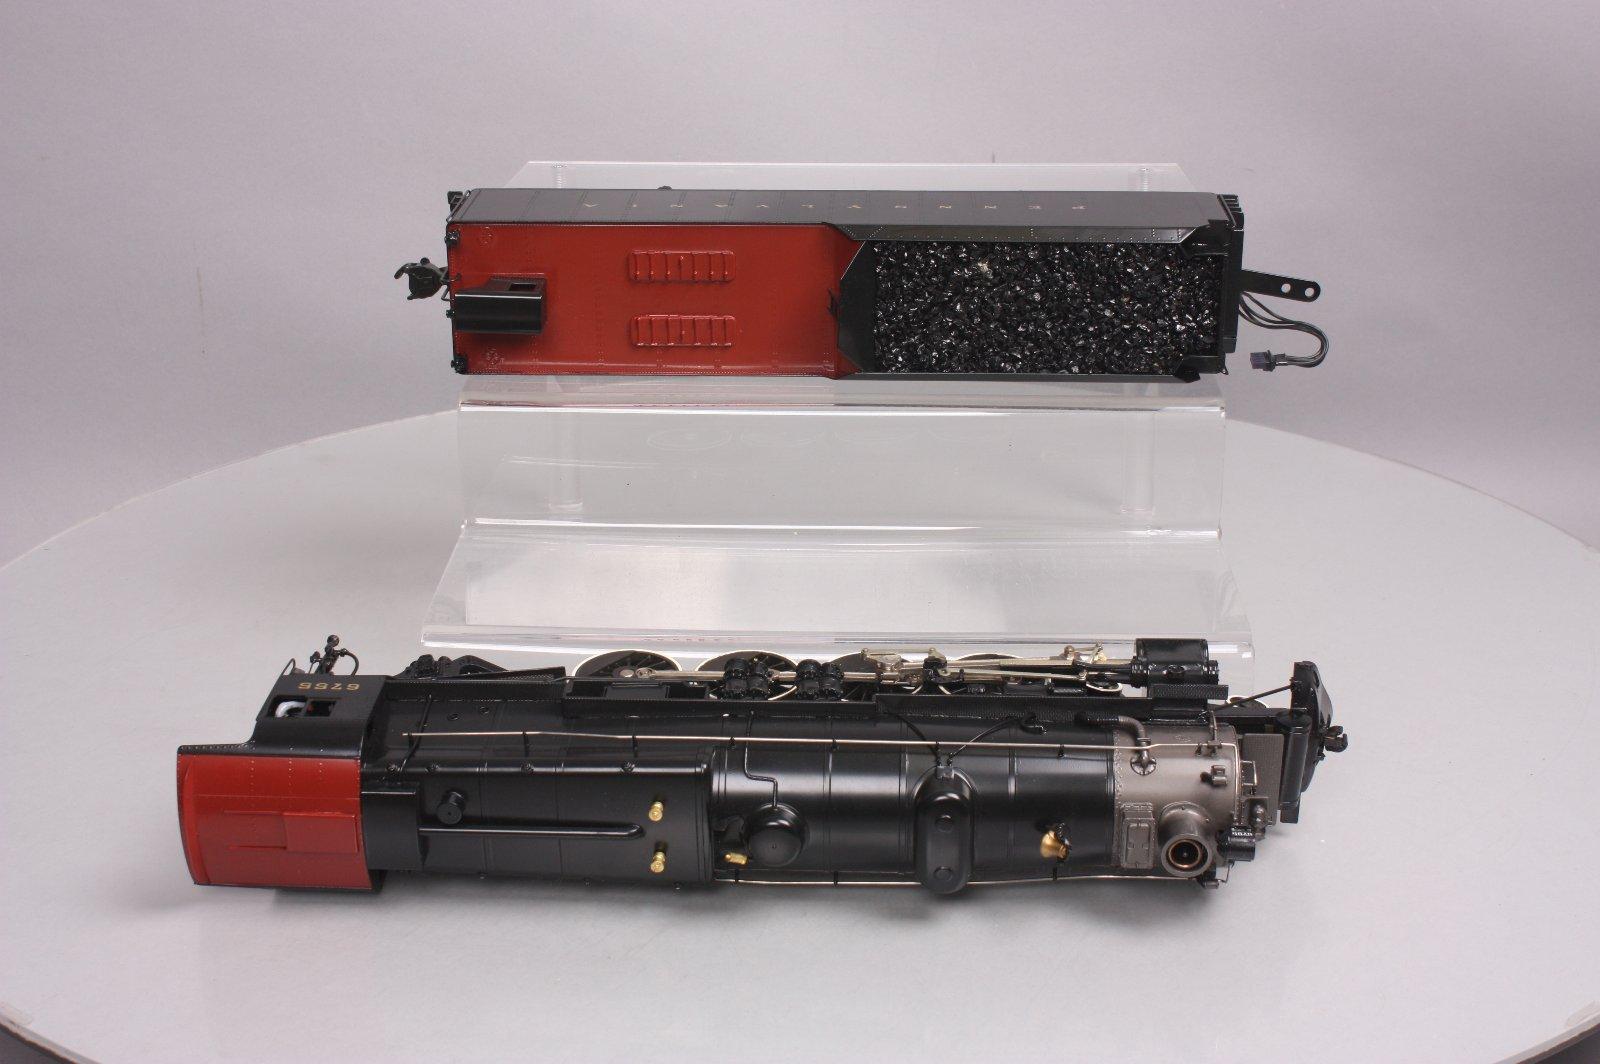 Weaver 6755 BRASS PRR 4-8-2 M1a Mountain Steam Engine & Tender - 3 Rail  LN/Box | eBay